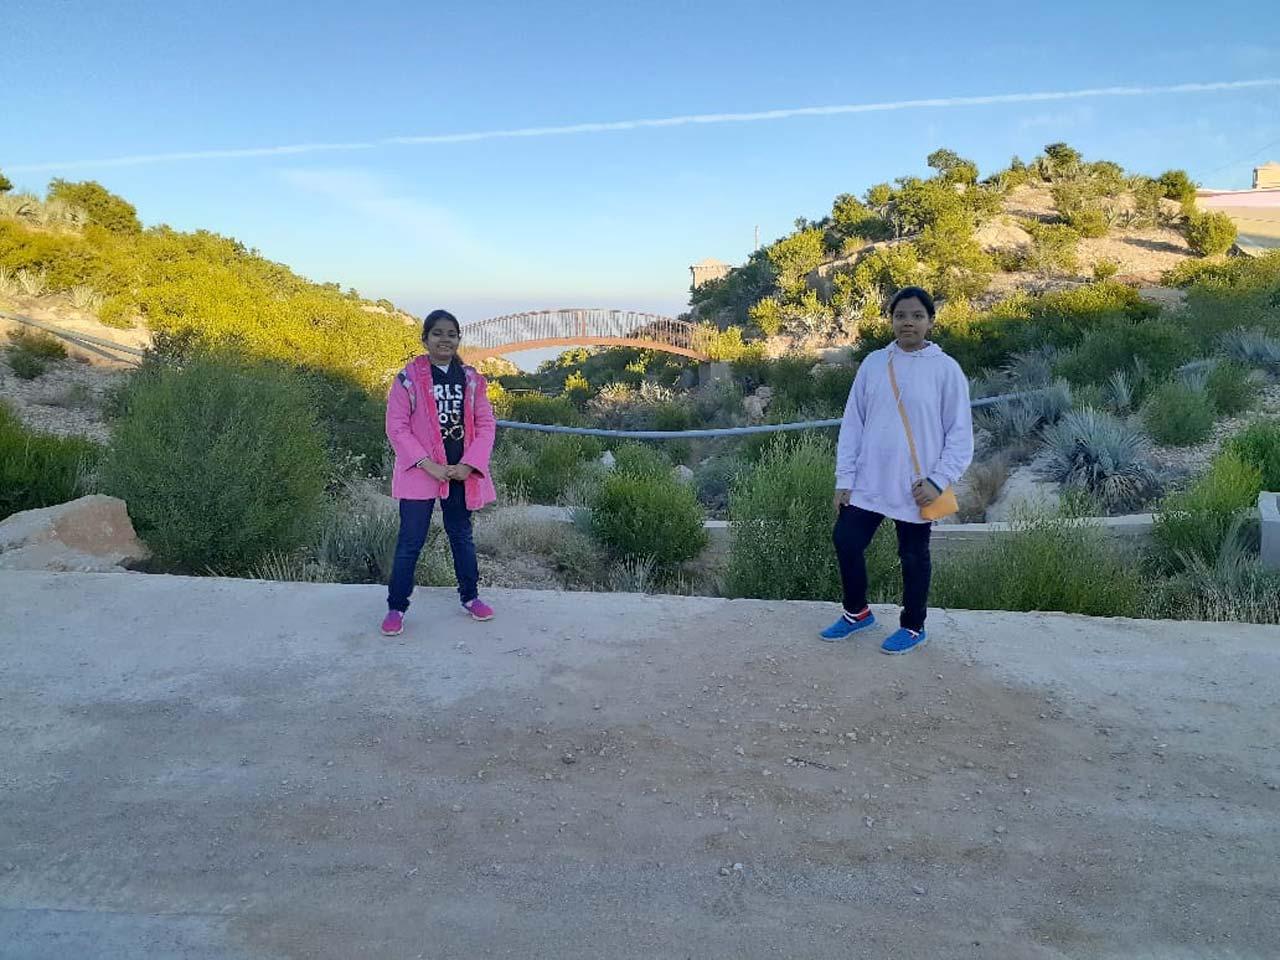 Zoya and Zara are enjoying the view climbing up the mountain